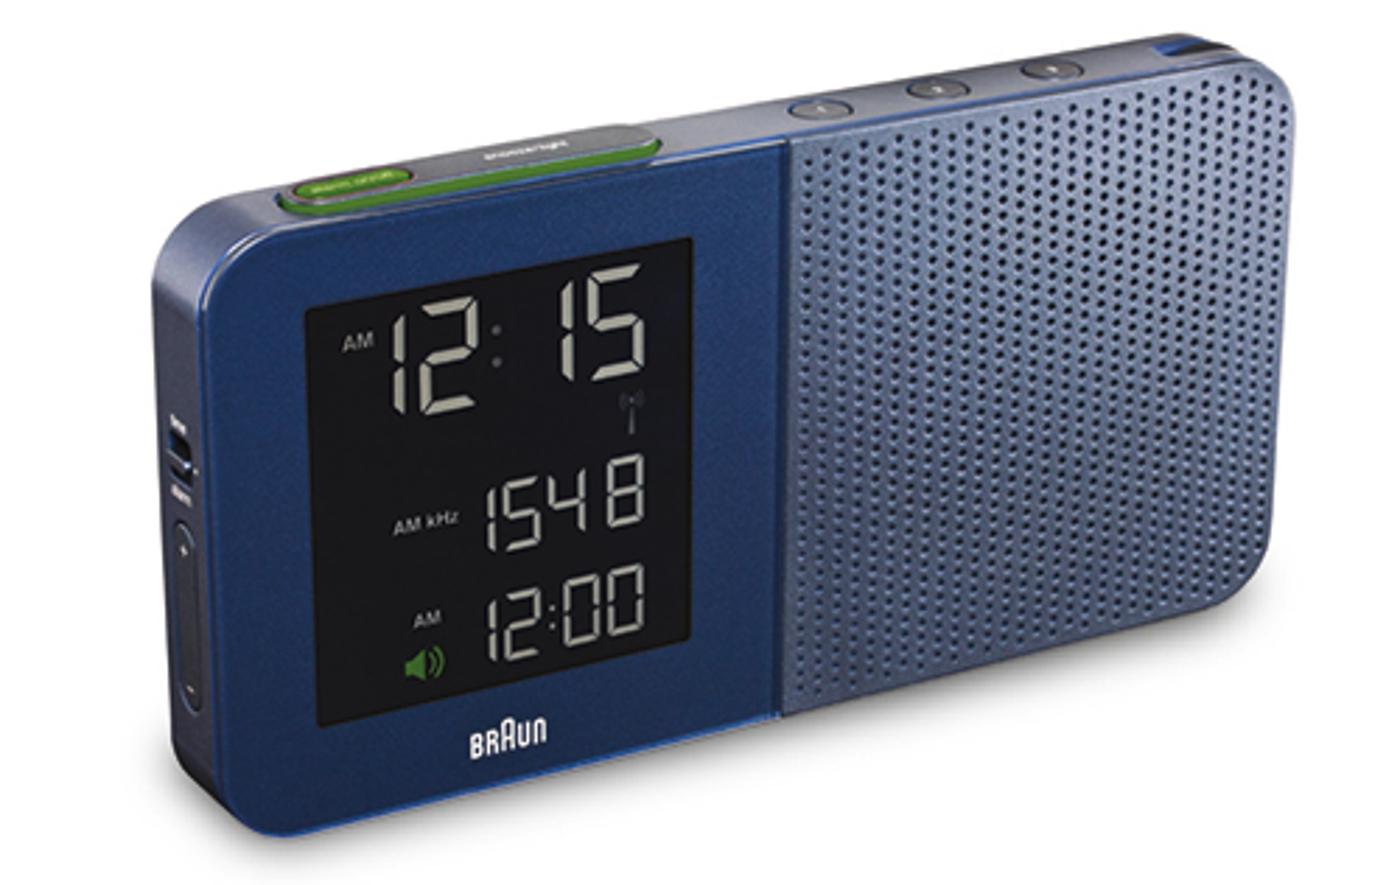 2x TD-V26 Mini win to day euromillionen bwin bestehenden Kundenangebotscodes LCD Stereo Lautsprecher Musik Mp3 FM Radio bwin Mobile Premium 3W R/L ...